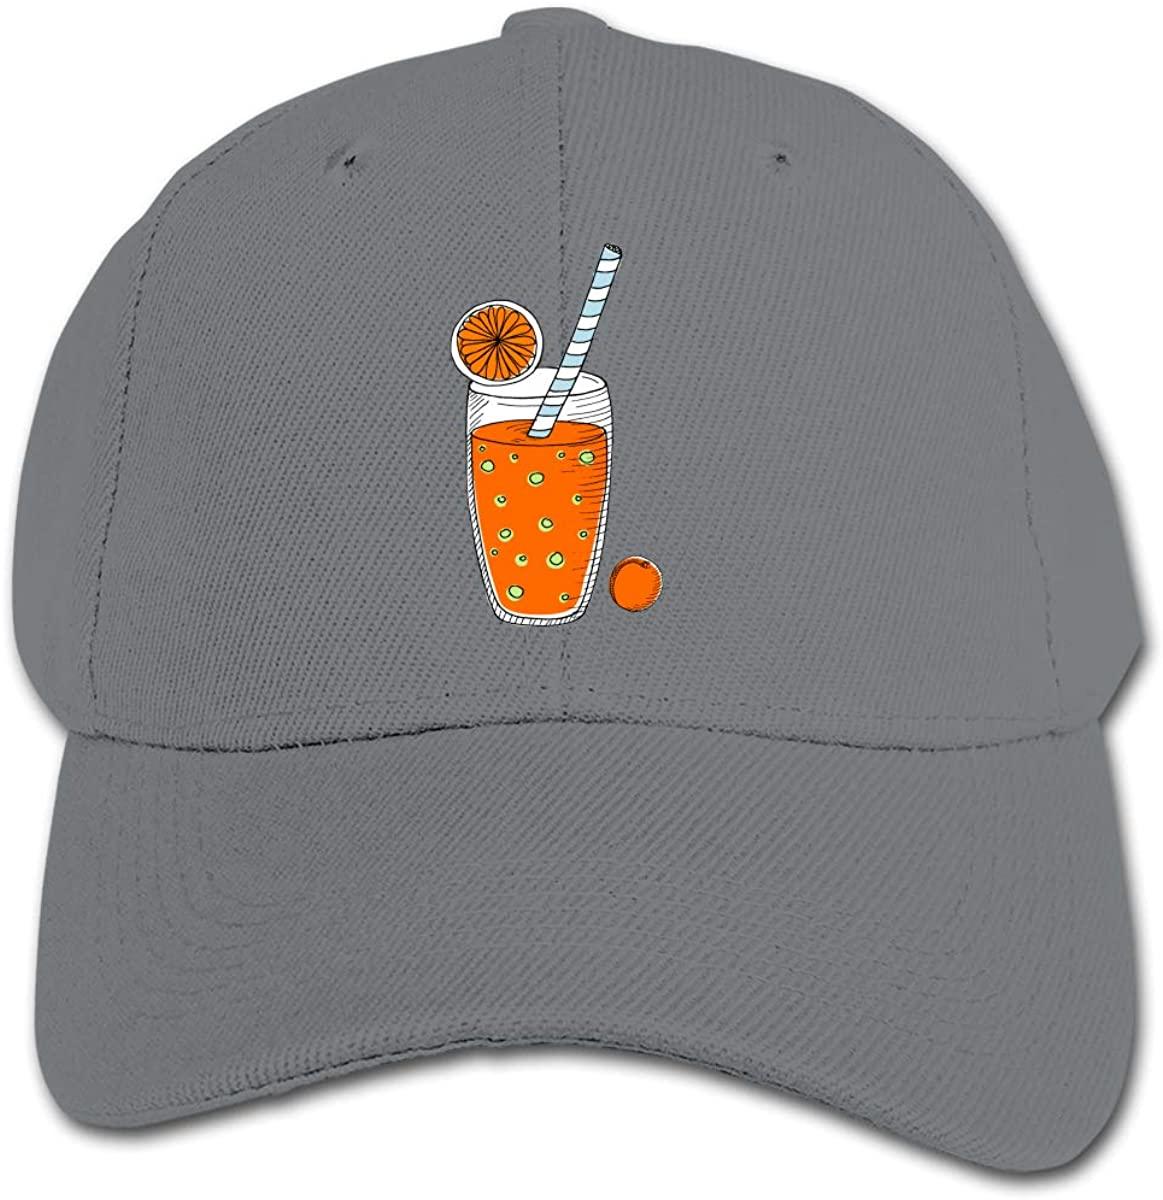 Orange Juice Kid's Daily Sun Protection,Casual, Baseball Cap, Adjustable Cartoon Hat Cap